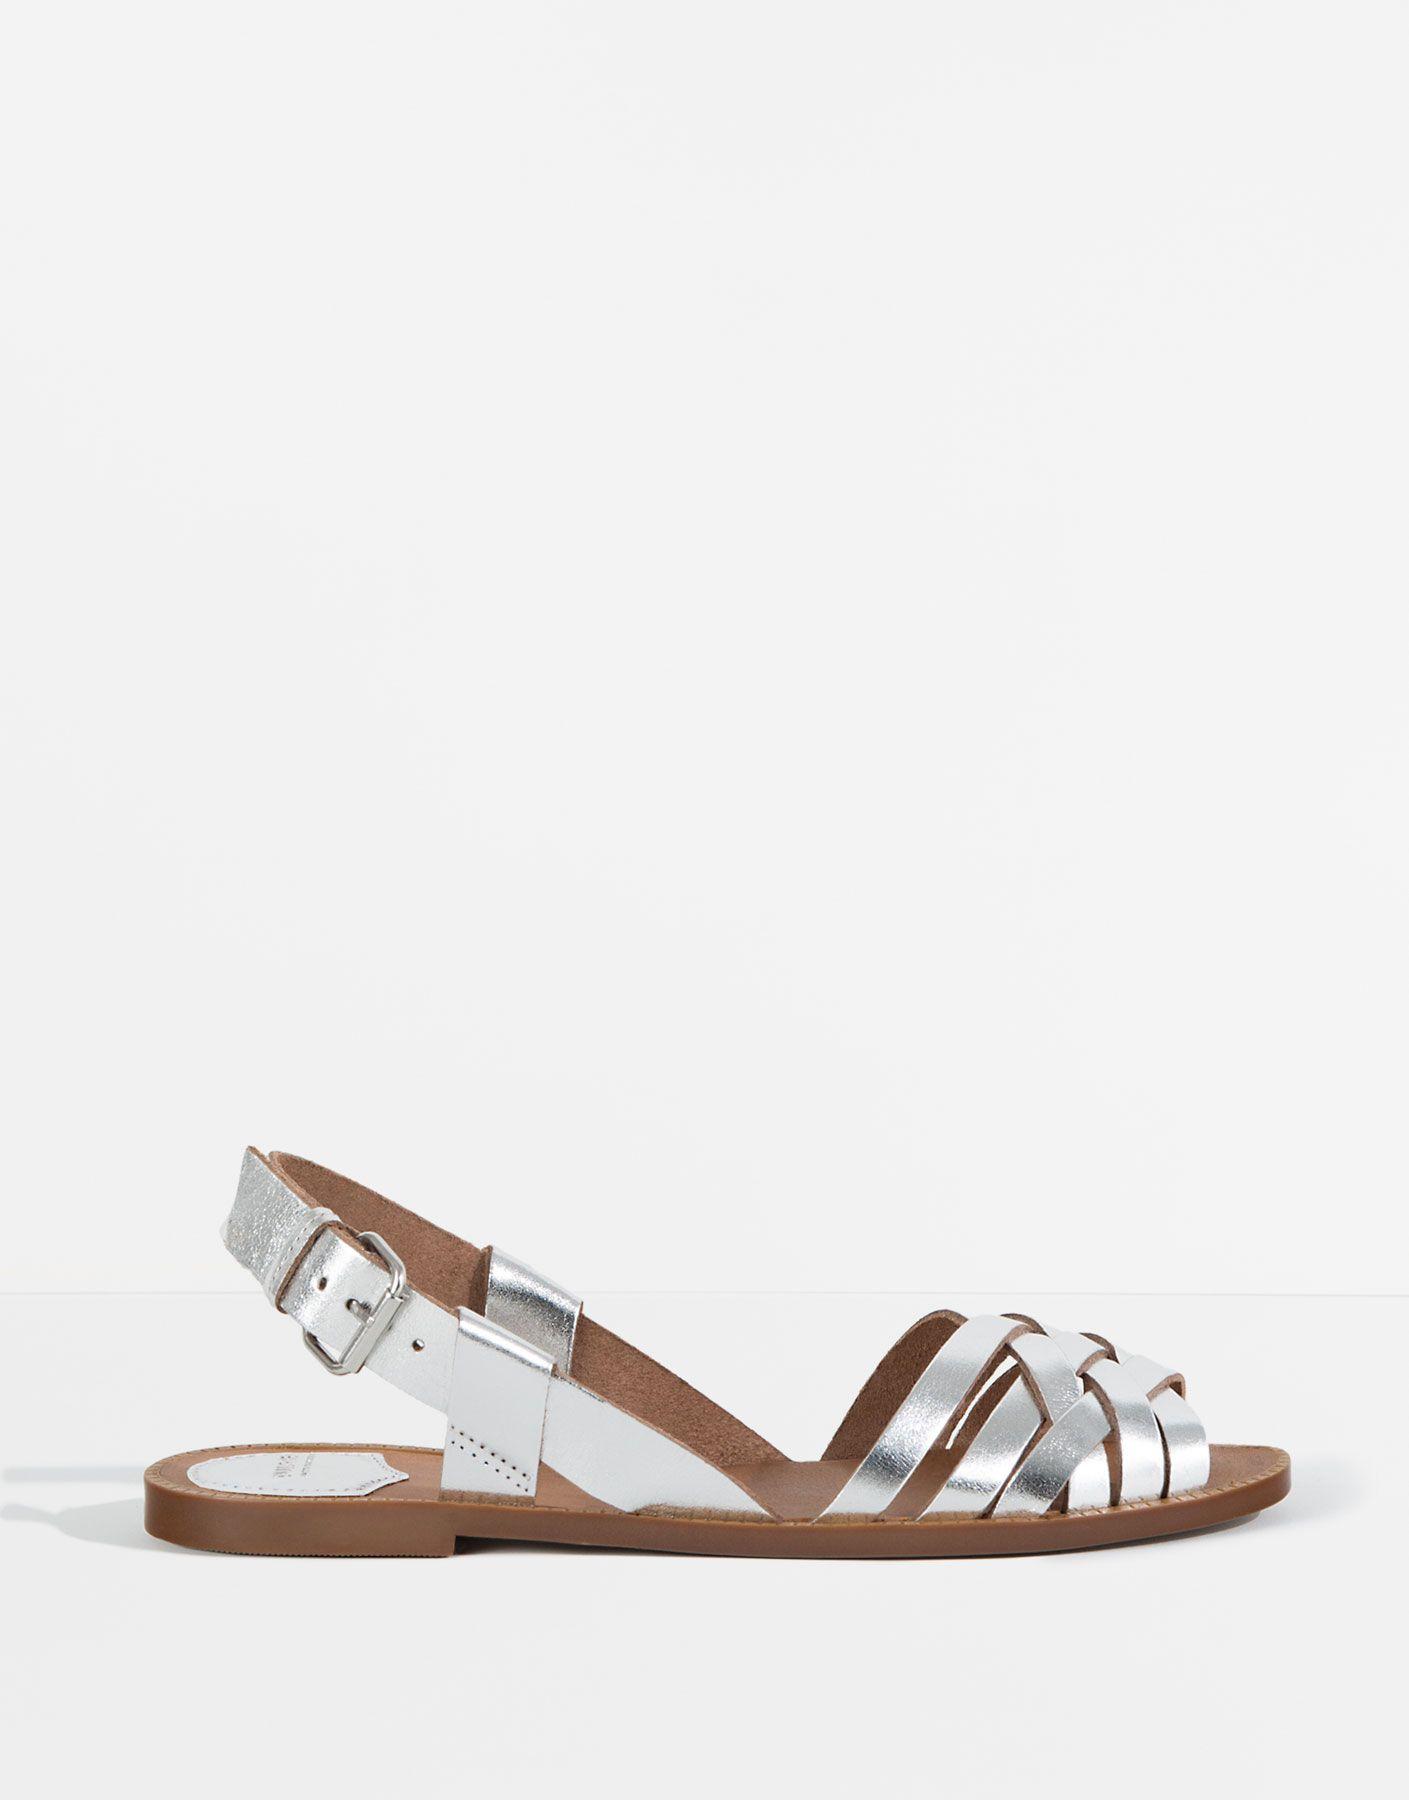 FranceModa amp;bear Cuir Sandales Chaussures Femme Pull 54ARjL